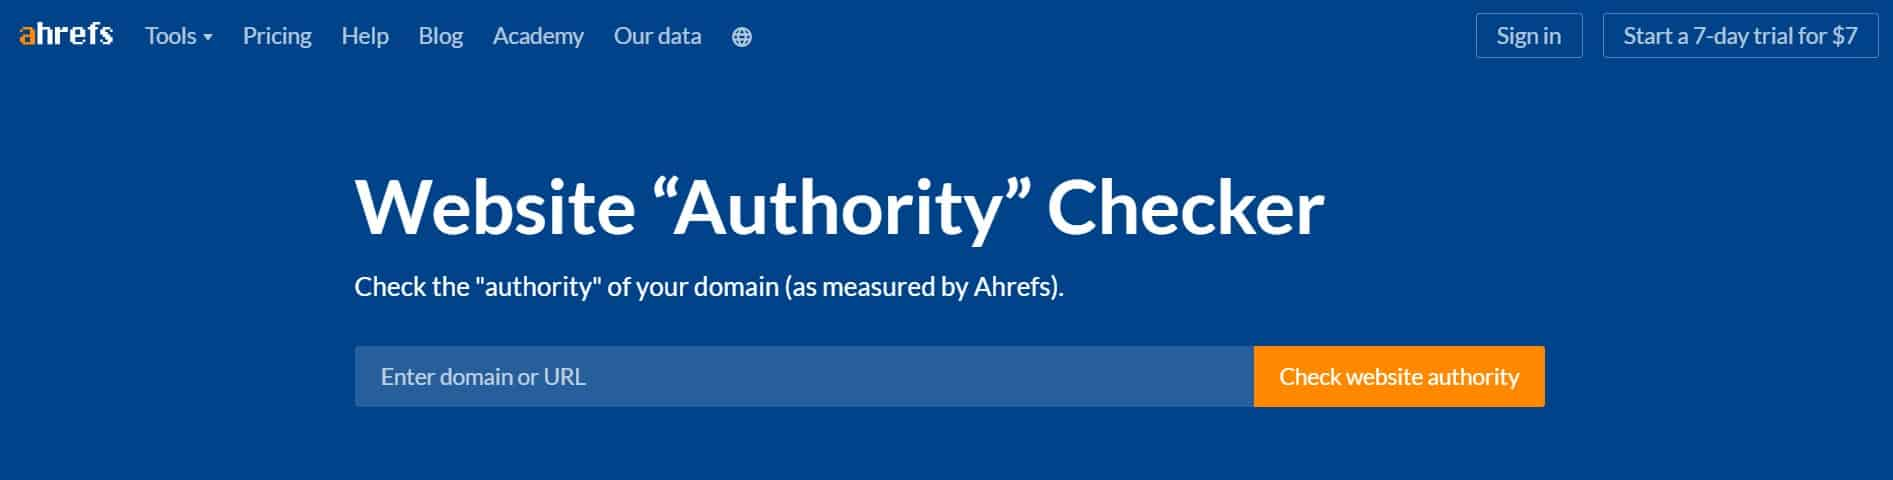 Ahrefs Website Authority Checker